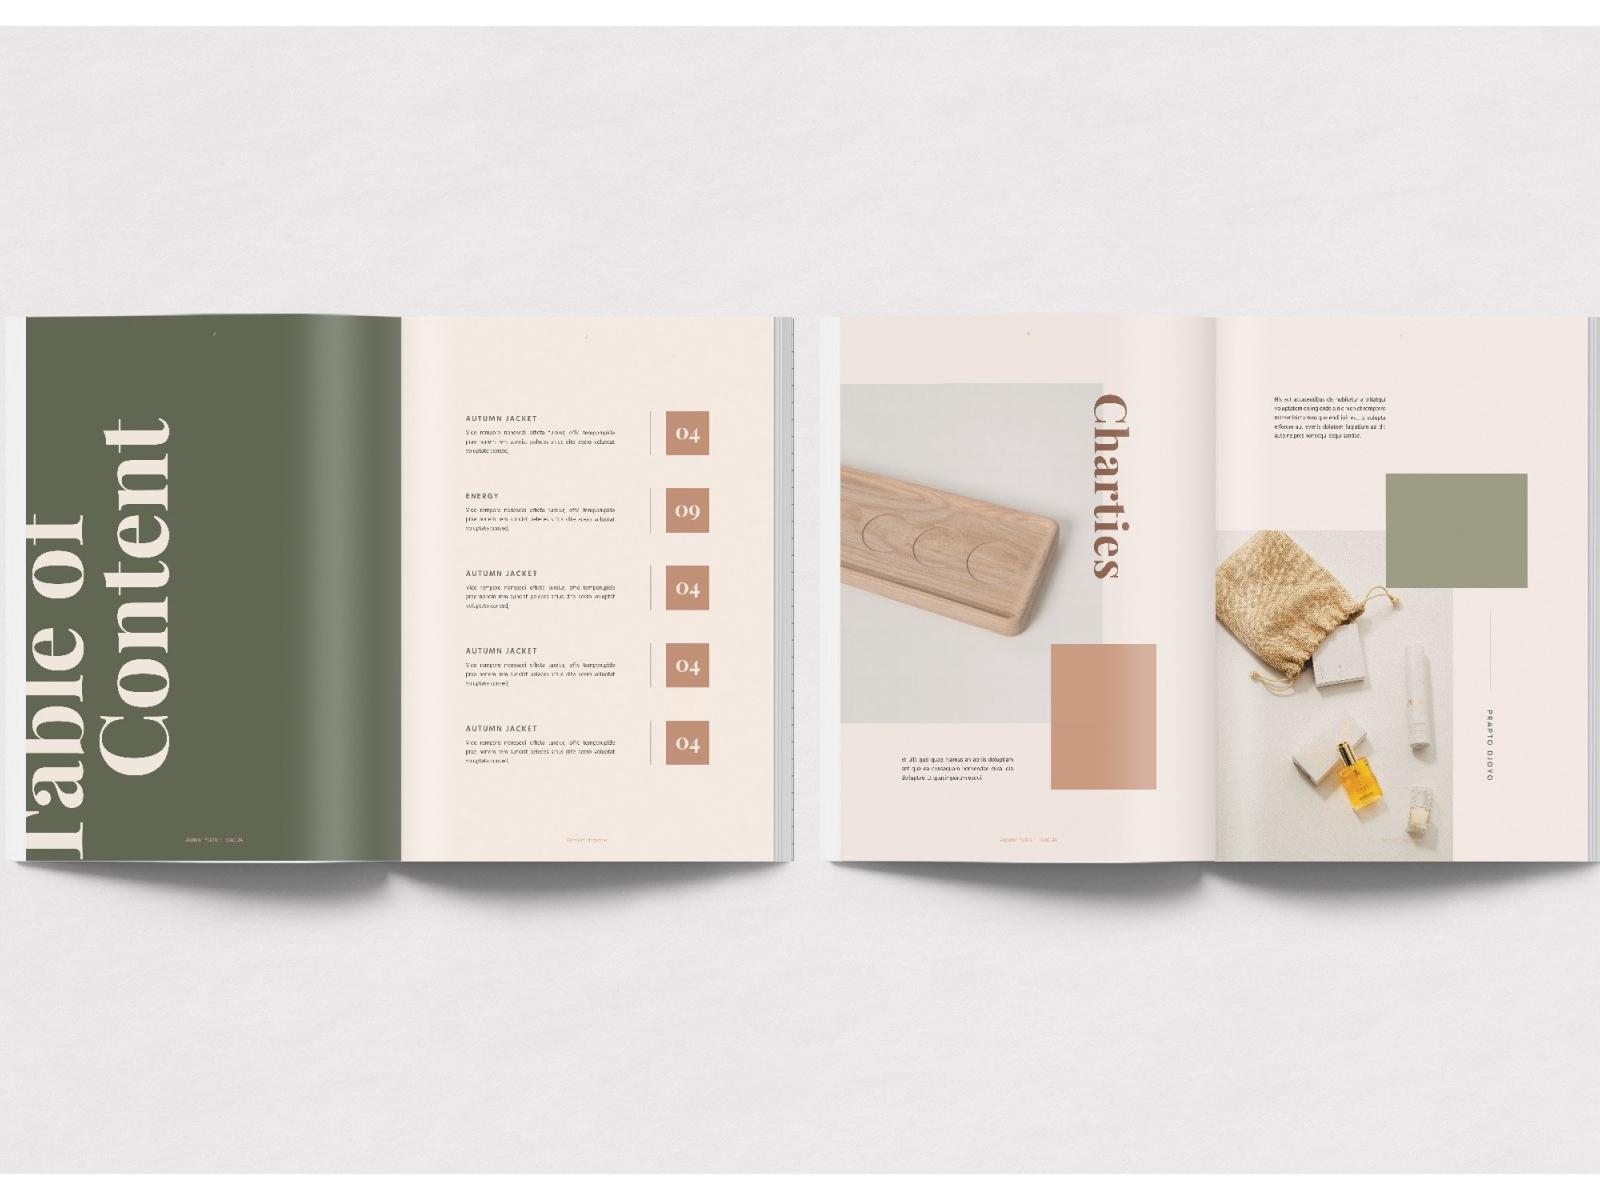 Geraldin Fashion Magazine By Brochure Design On Dribbble